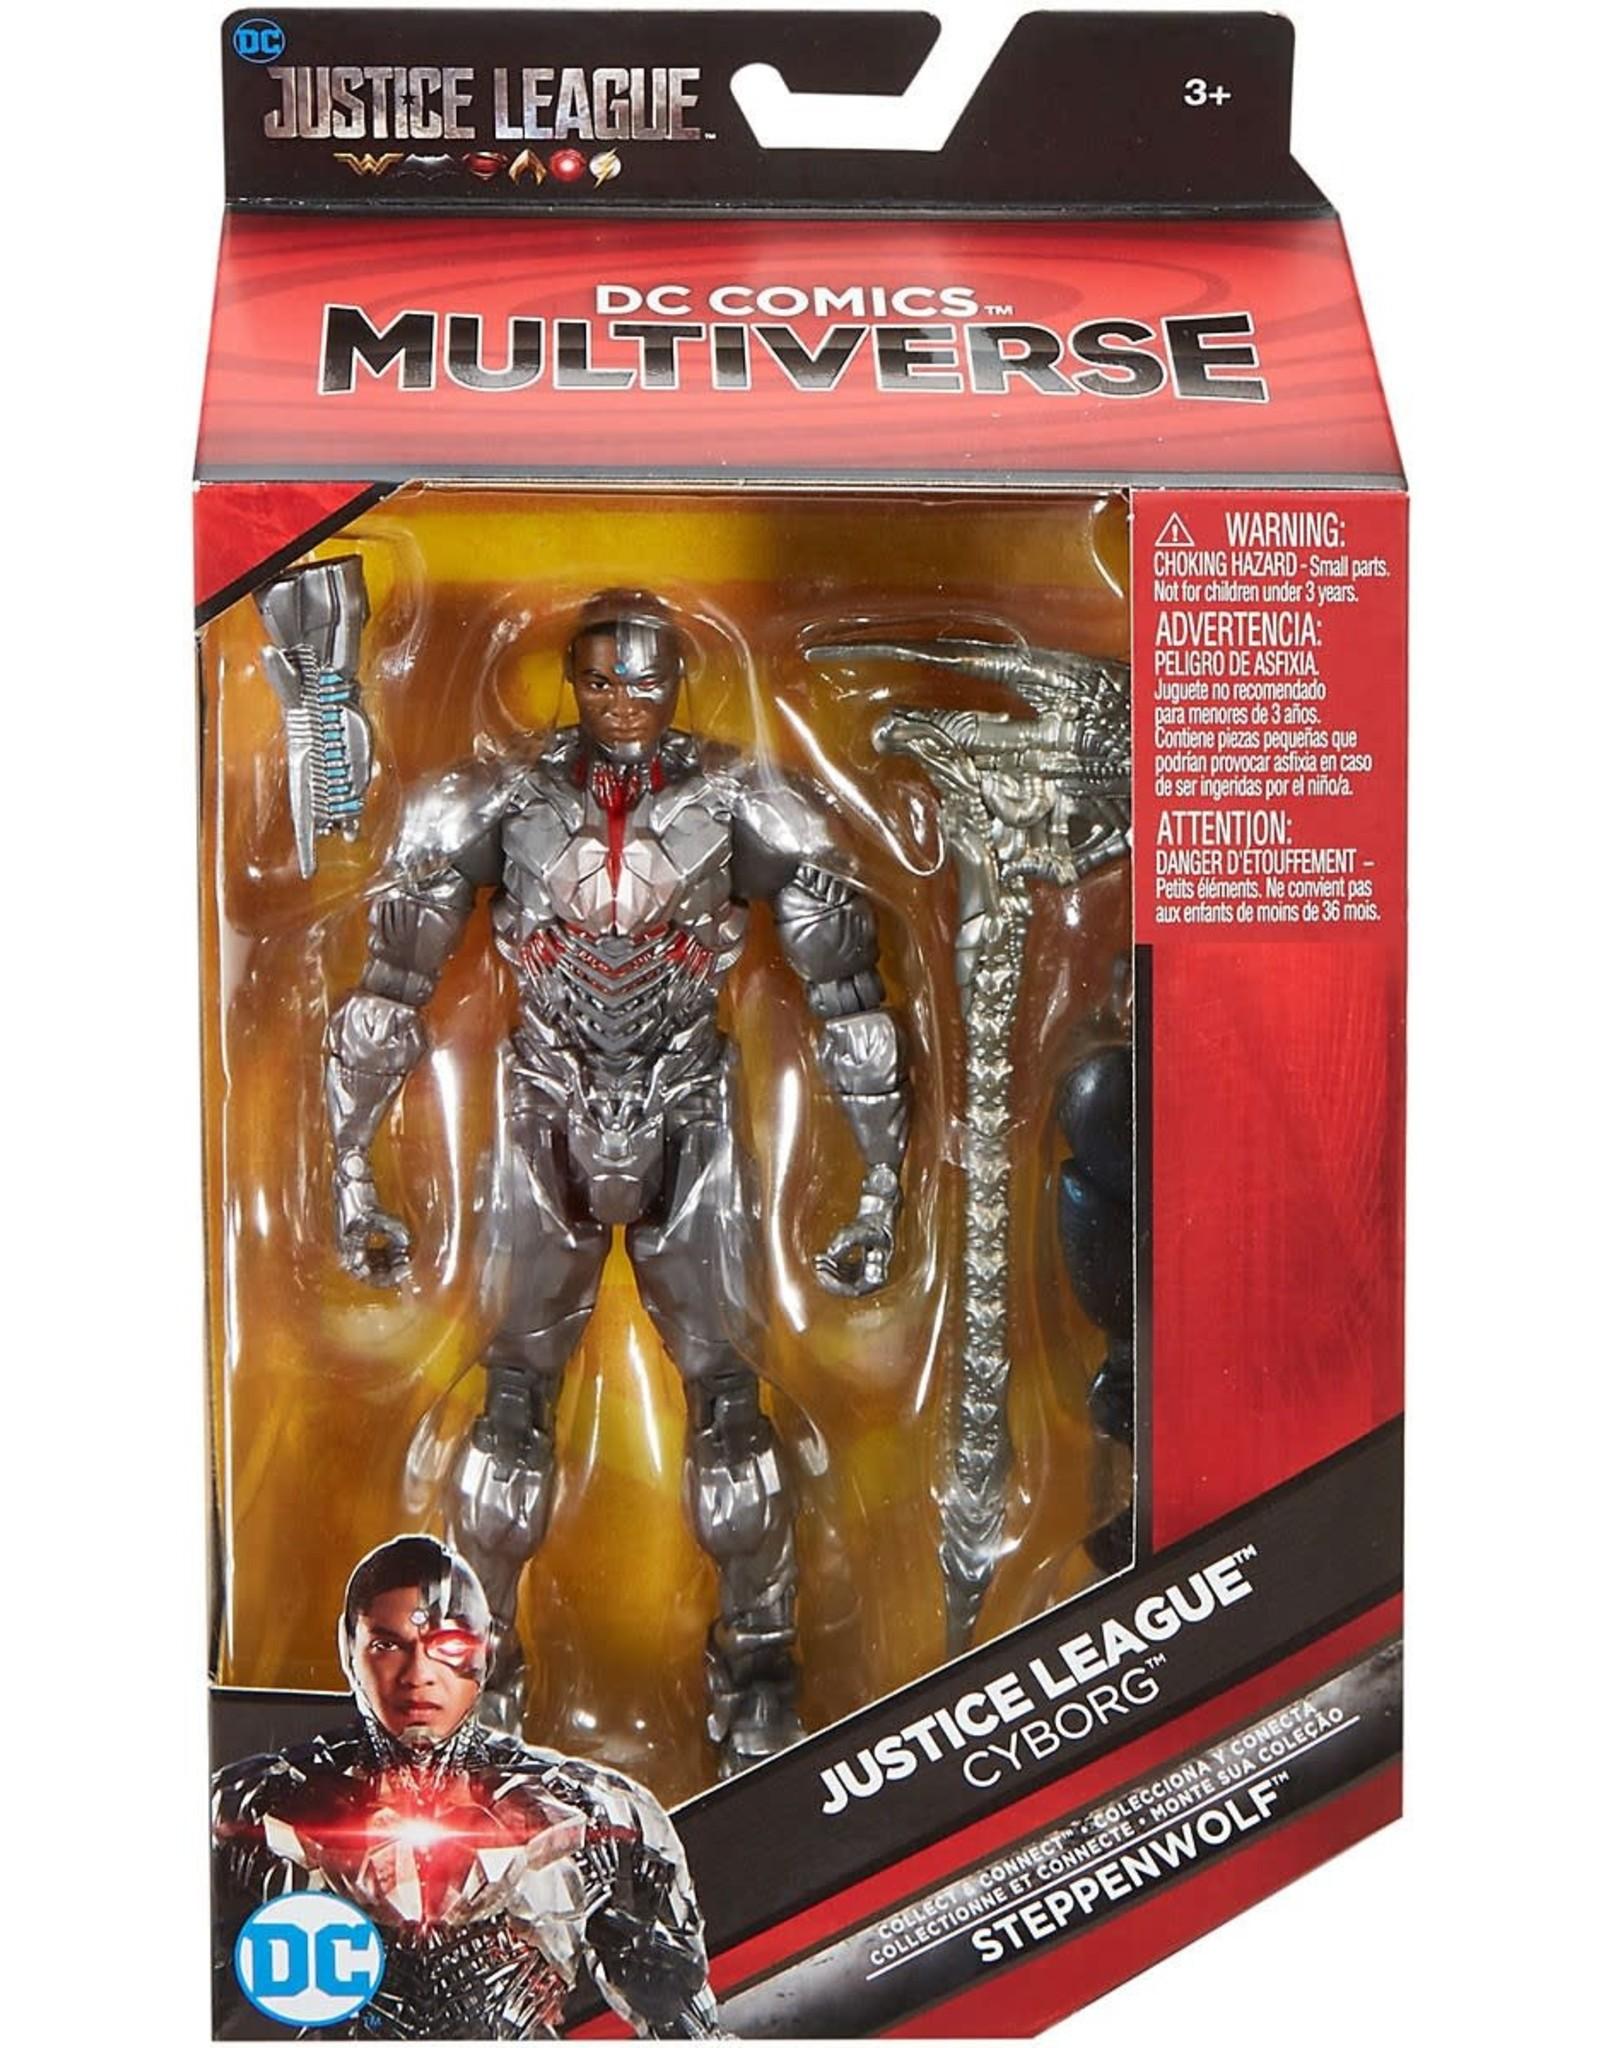 Mattel DC Comics Multiverse Justice League Cyborg Figure